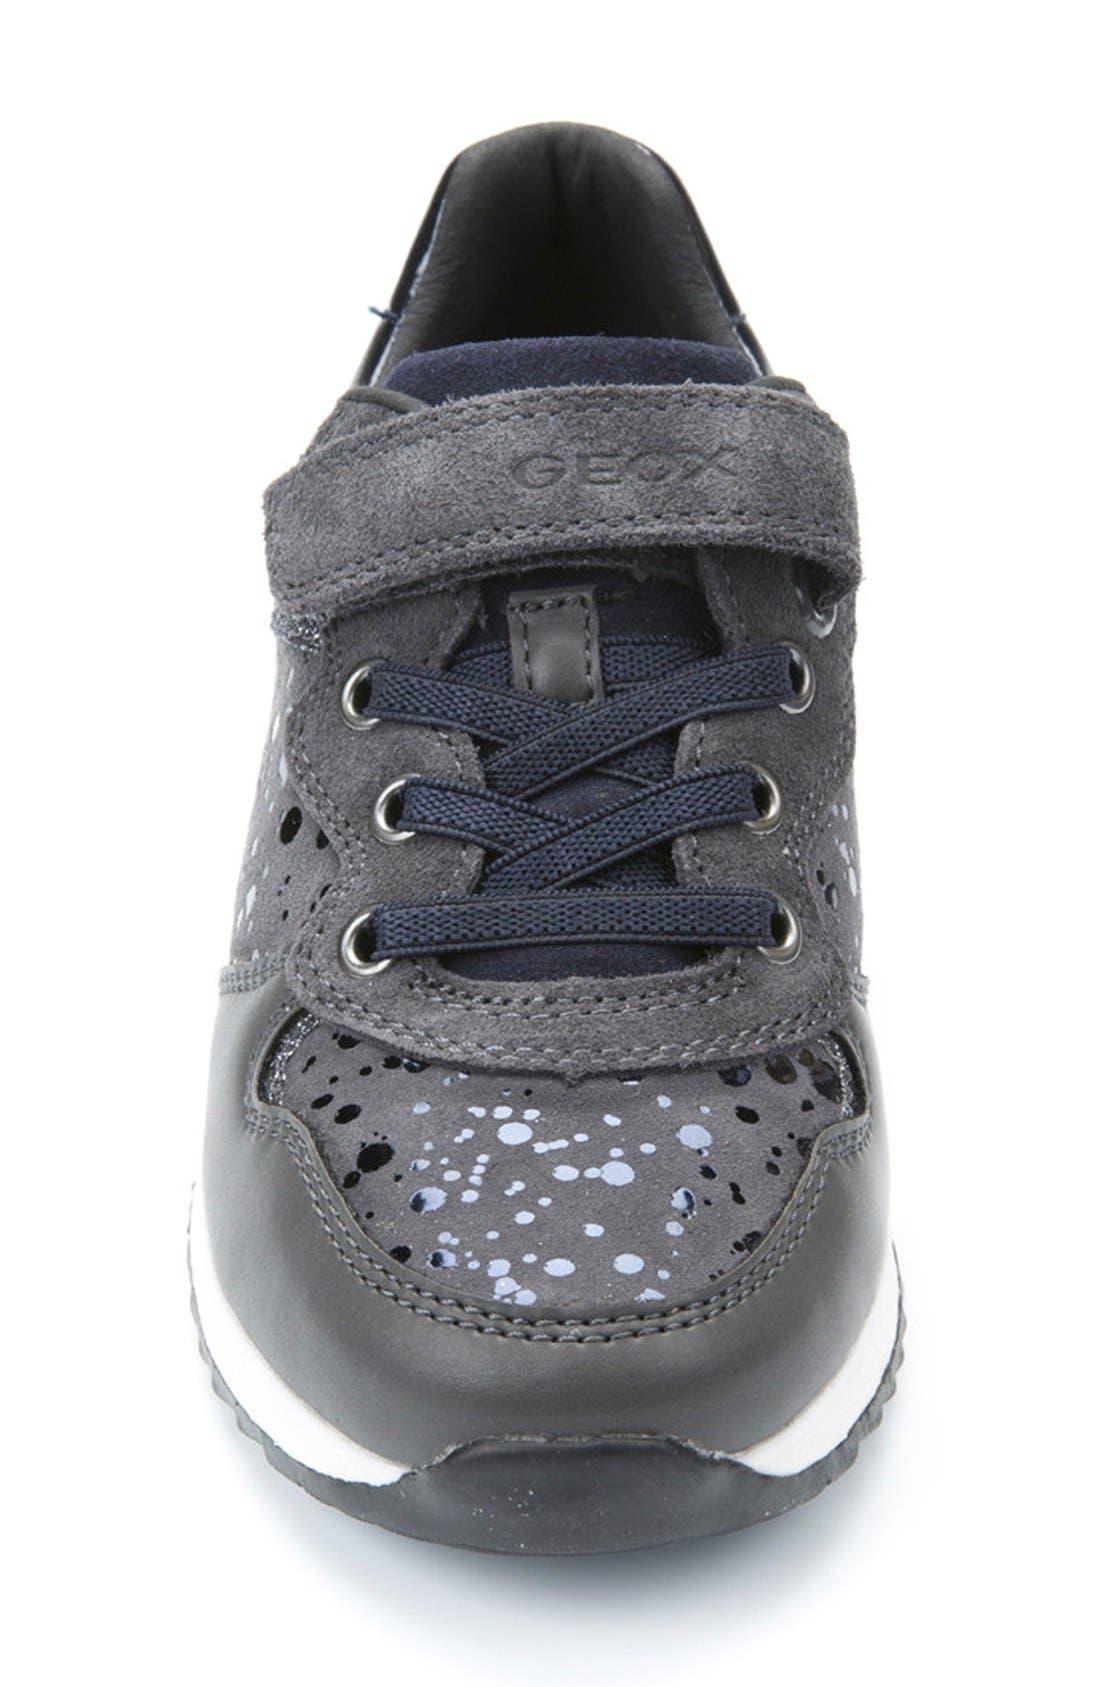 Maisie Sneaker,                             Alternate thumbnail 3, color,                             021